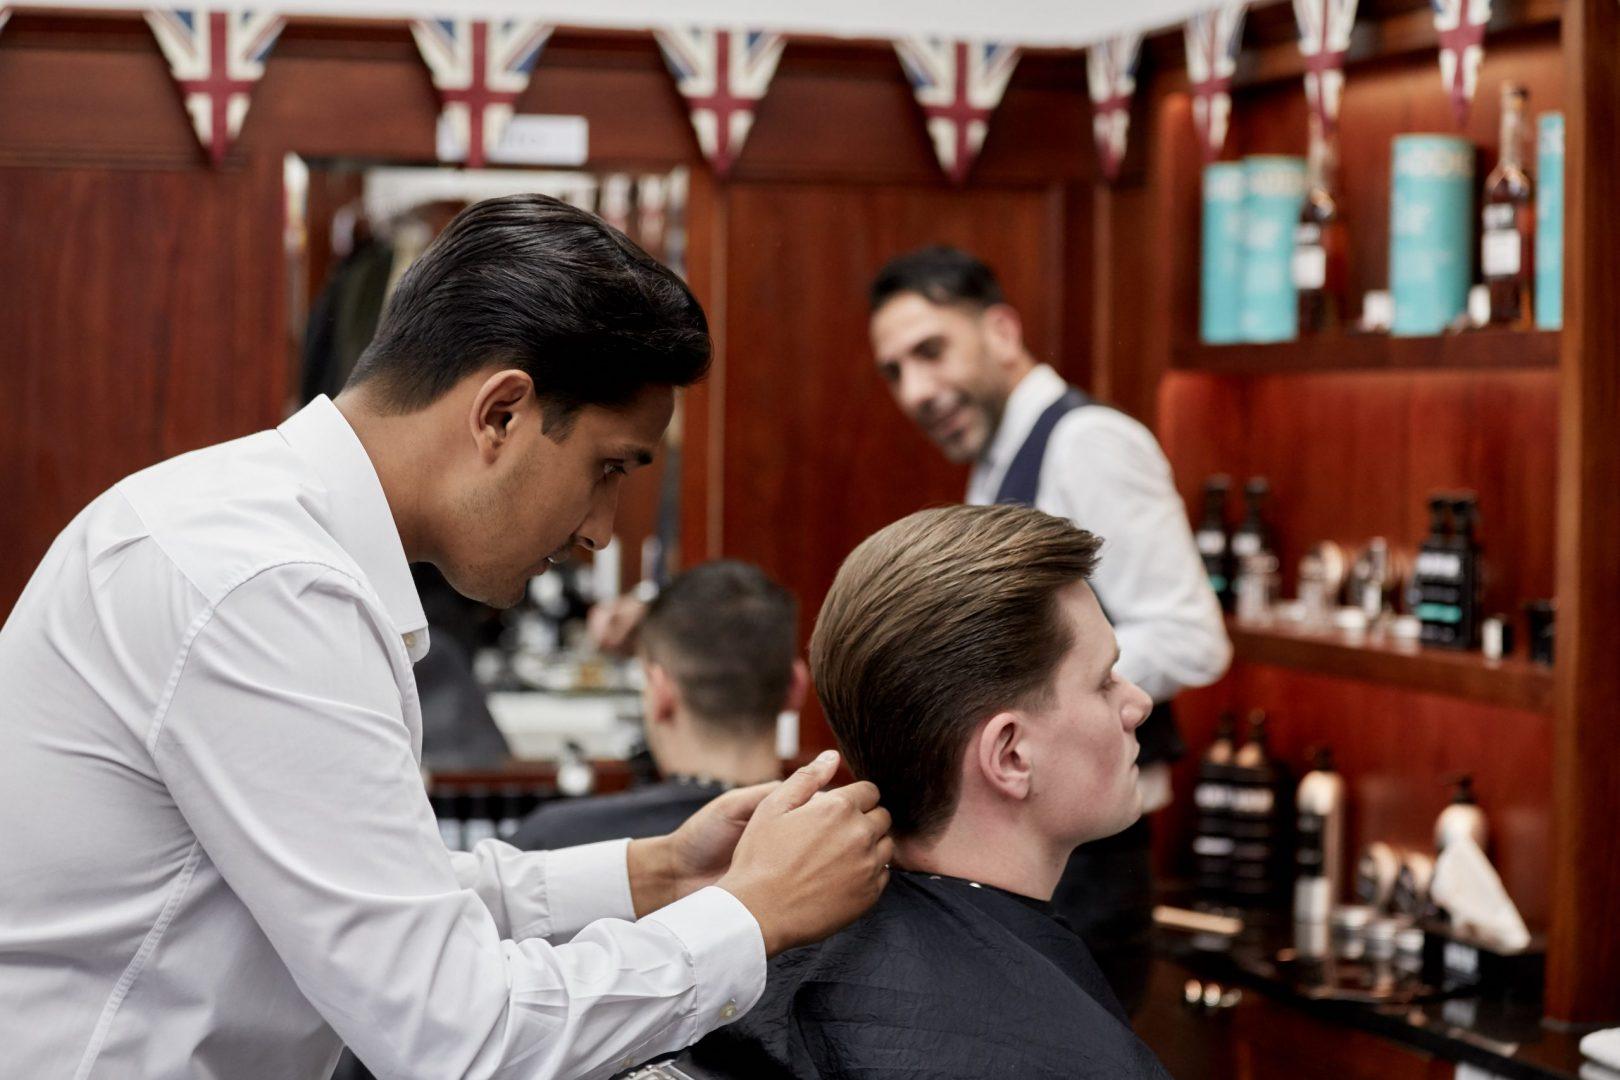 Barbers Tottenham Court Road - Best Barbers Near Totthenham Court Road - Pall Mall Barbers Fitzrovia